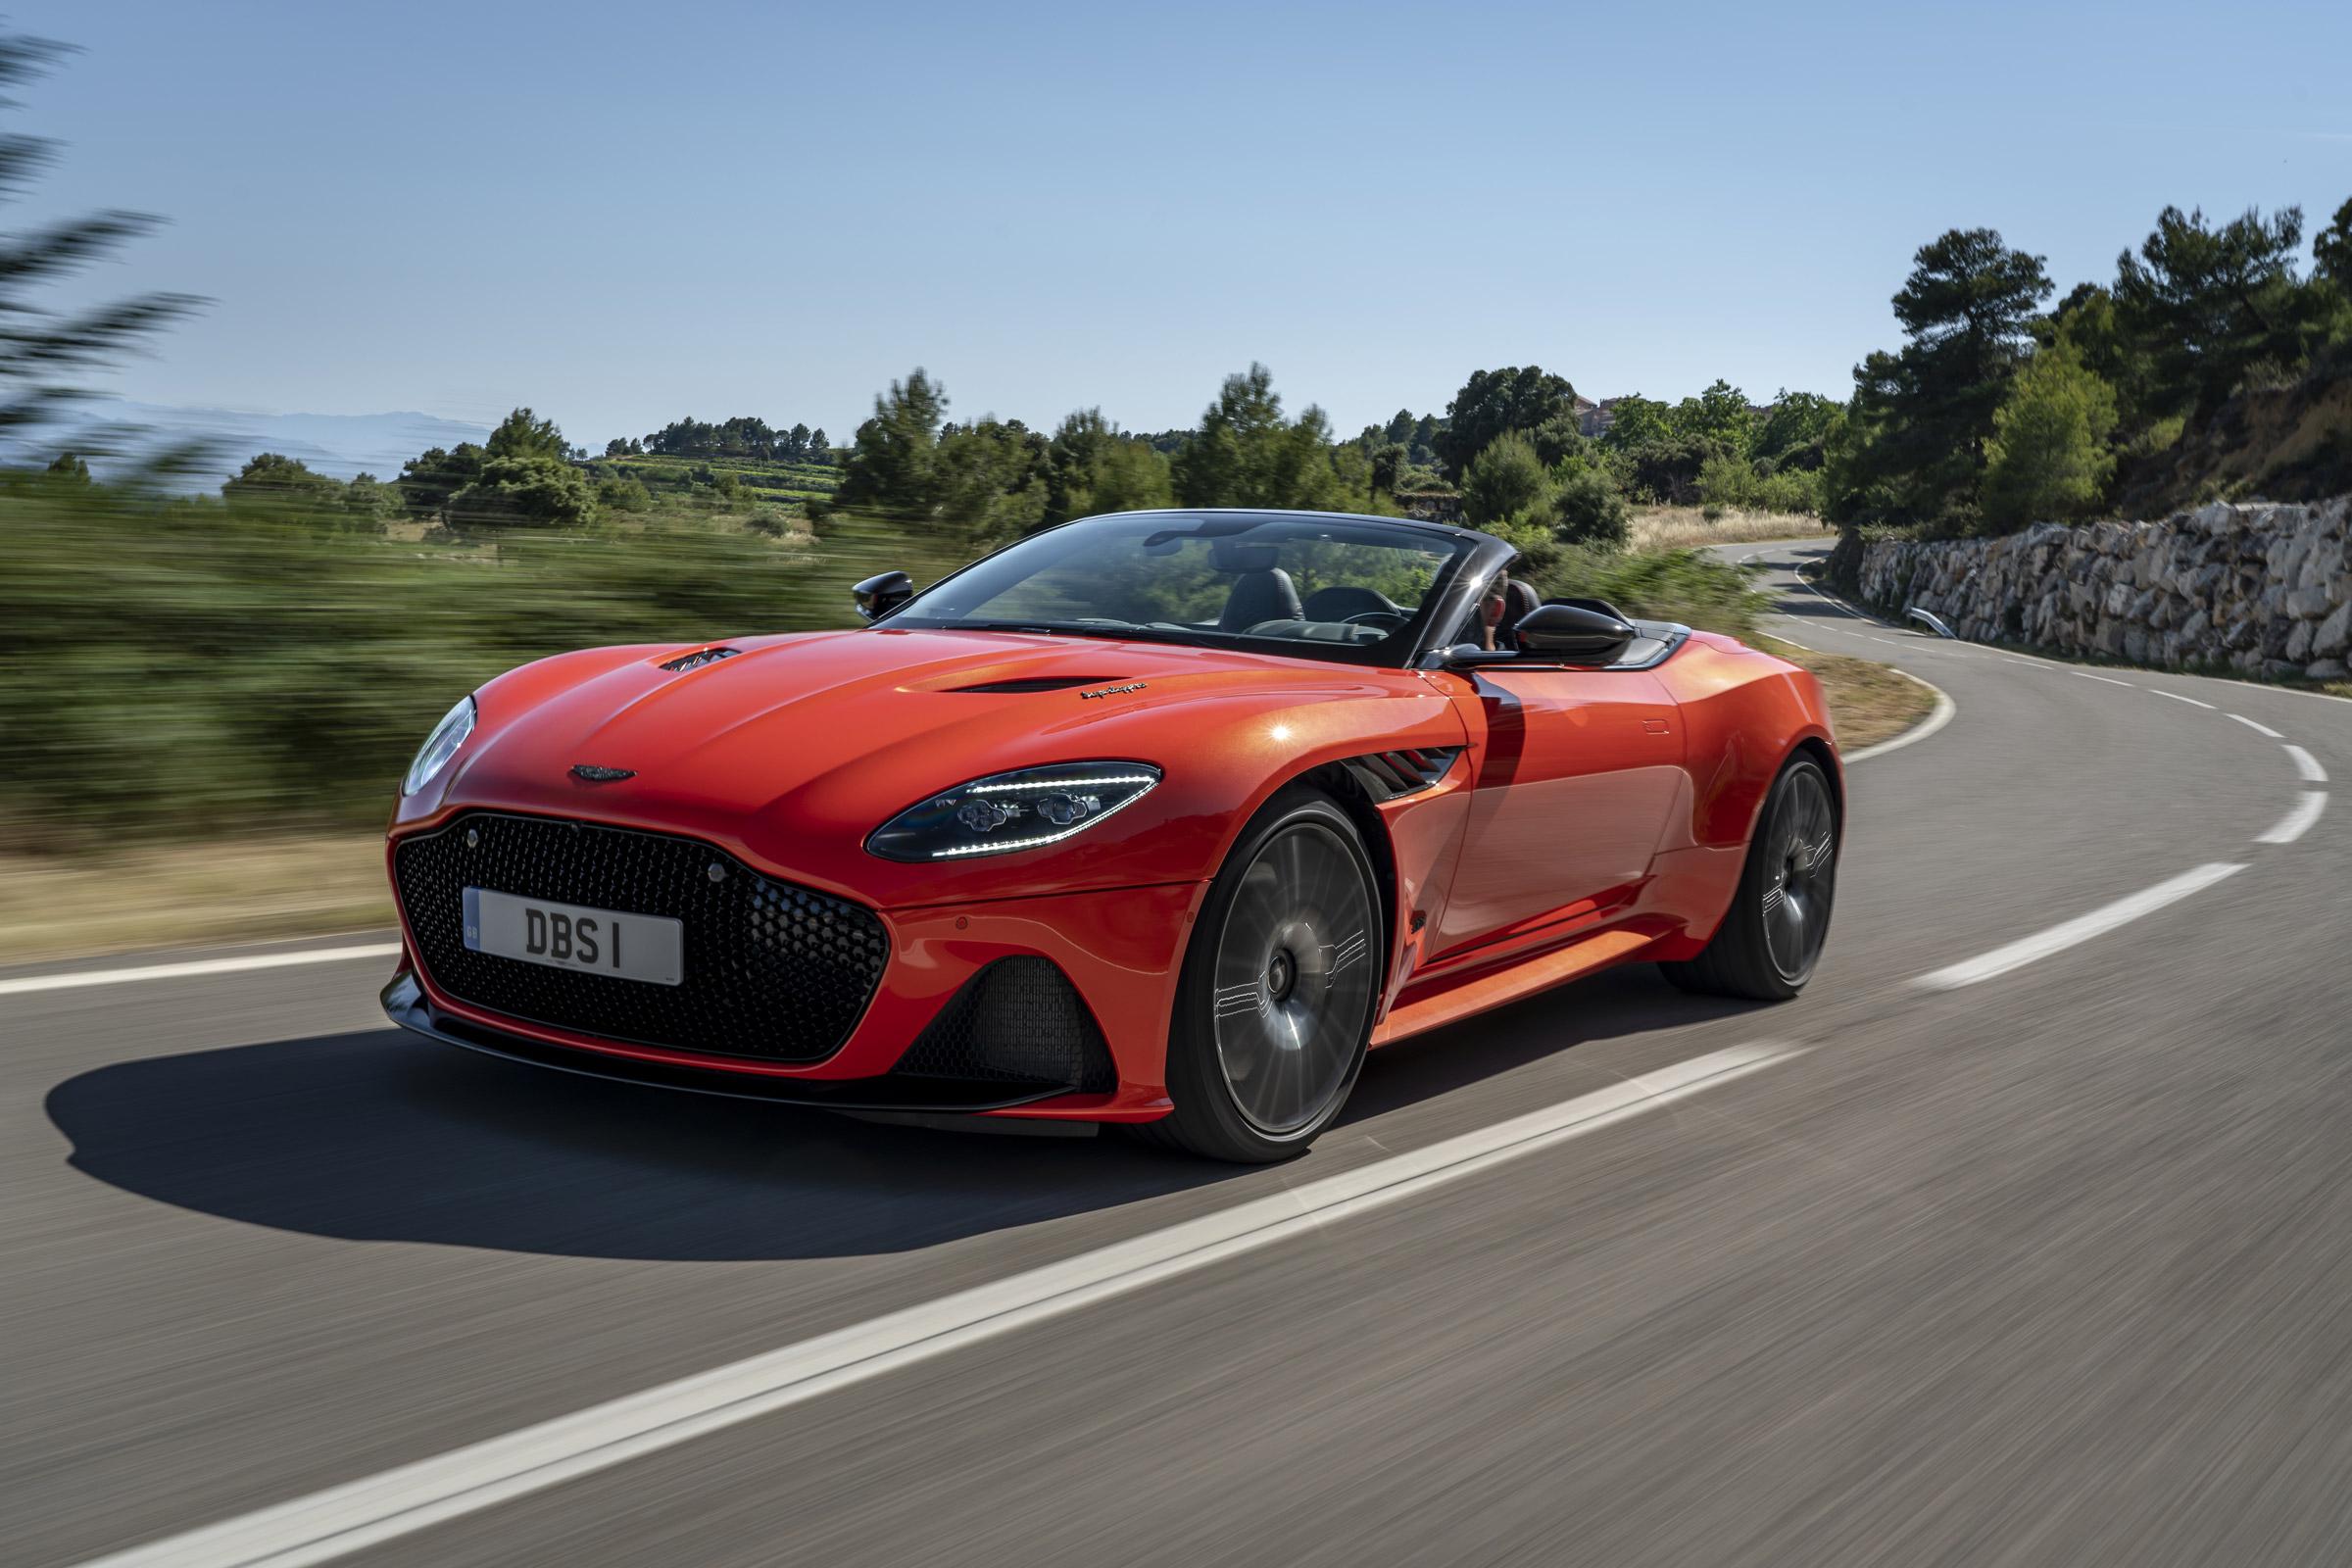 New Aston Martin Dbs Superleggera Volante 2020 Review Evo